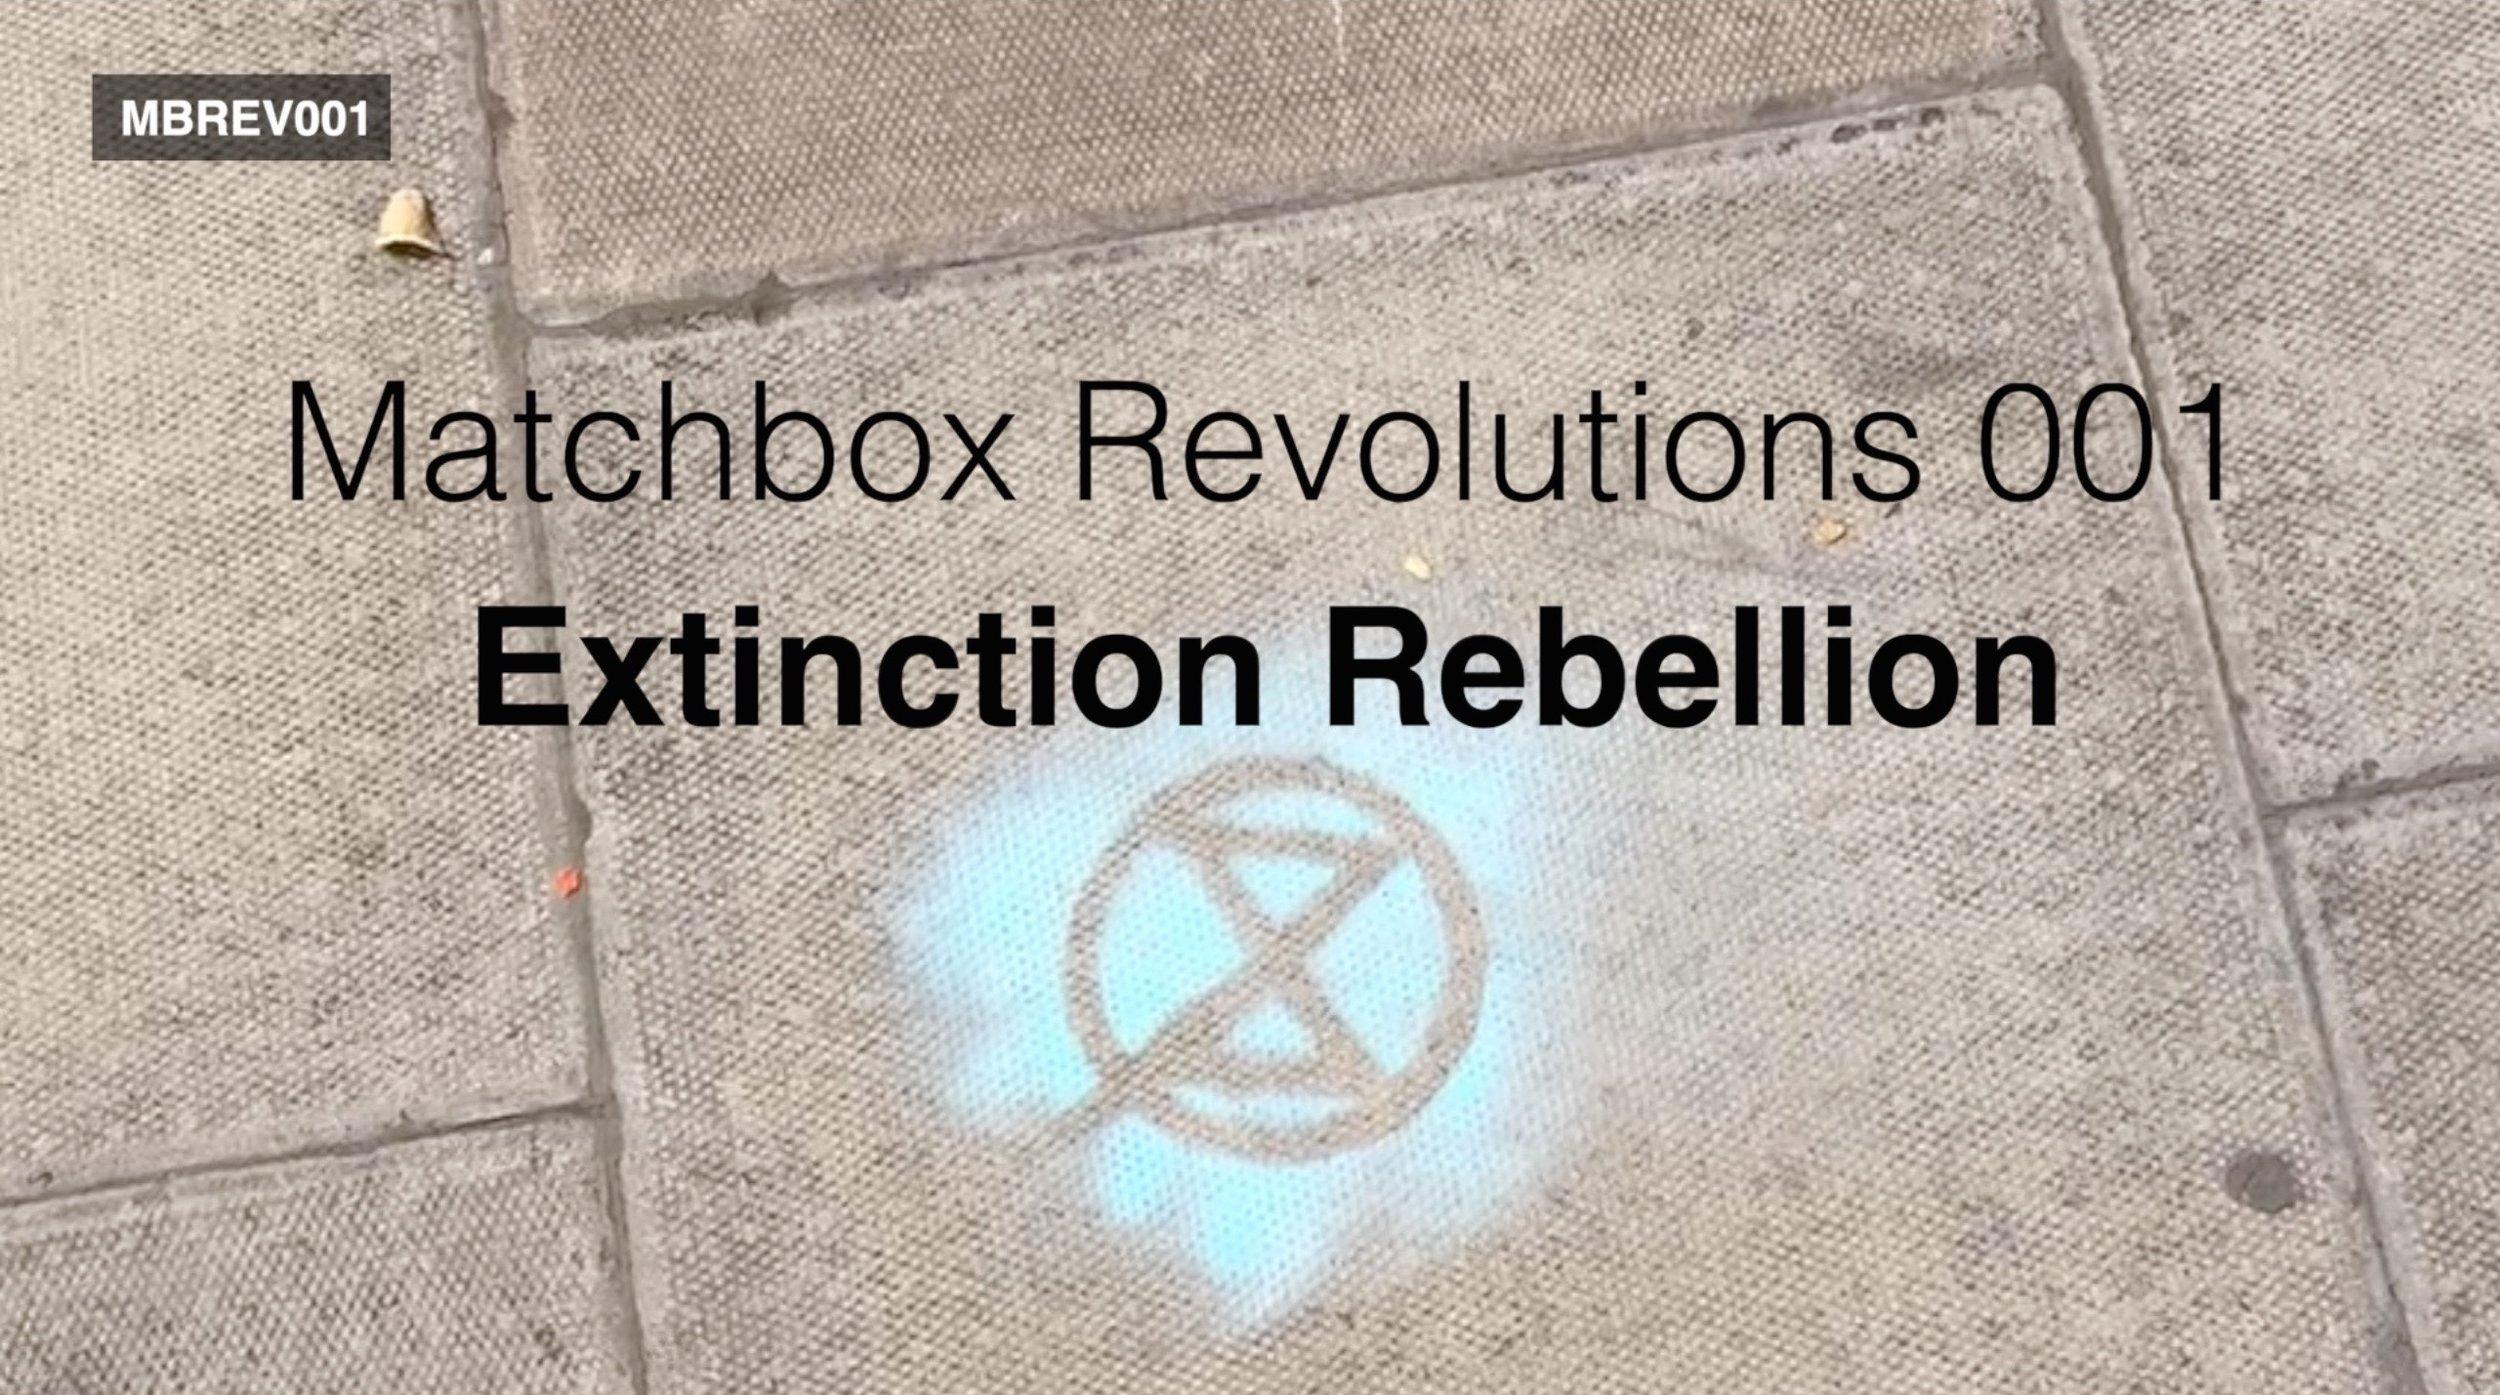 MATCHBOX REVOLUTIONS 001 - EXTINCTION REBELLION   ENVIRONMENTAL ACTIVIST GROUP EXTINCTION REBELLION OCCUPY WATERLOO BRIDGE.